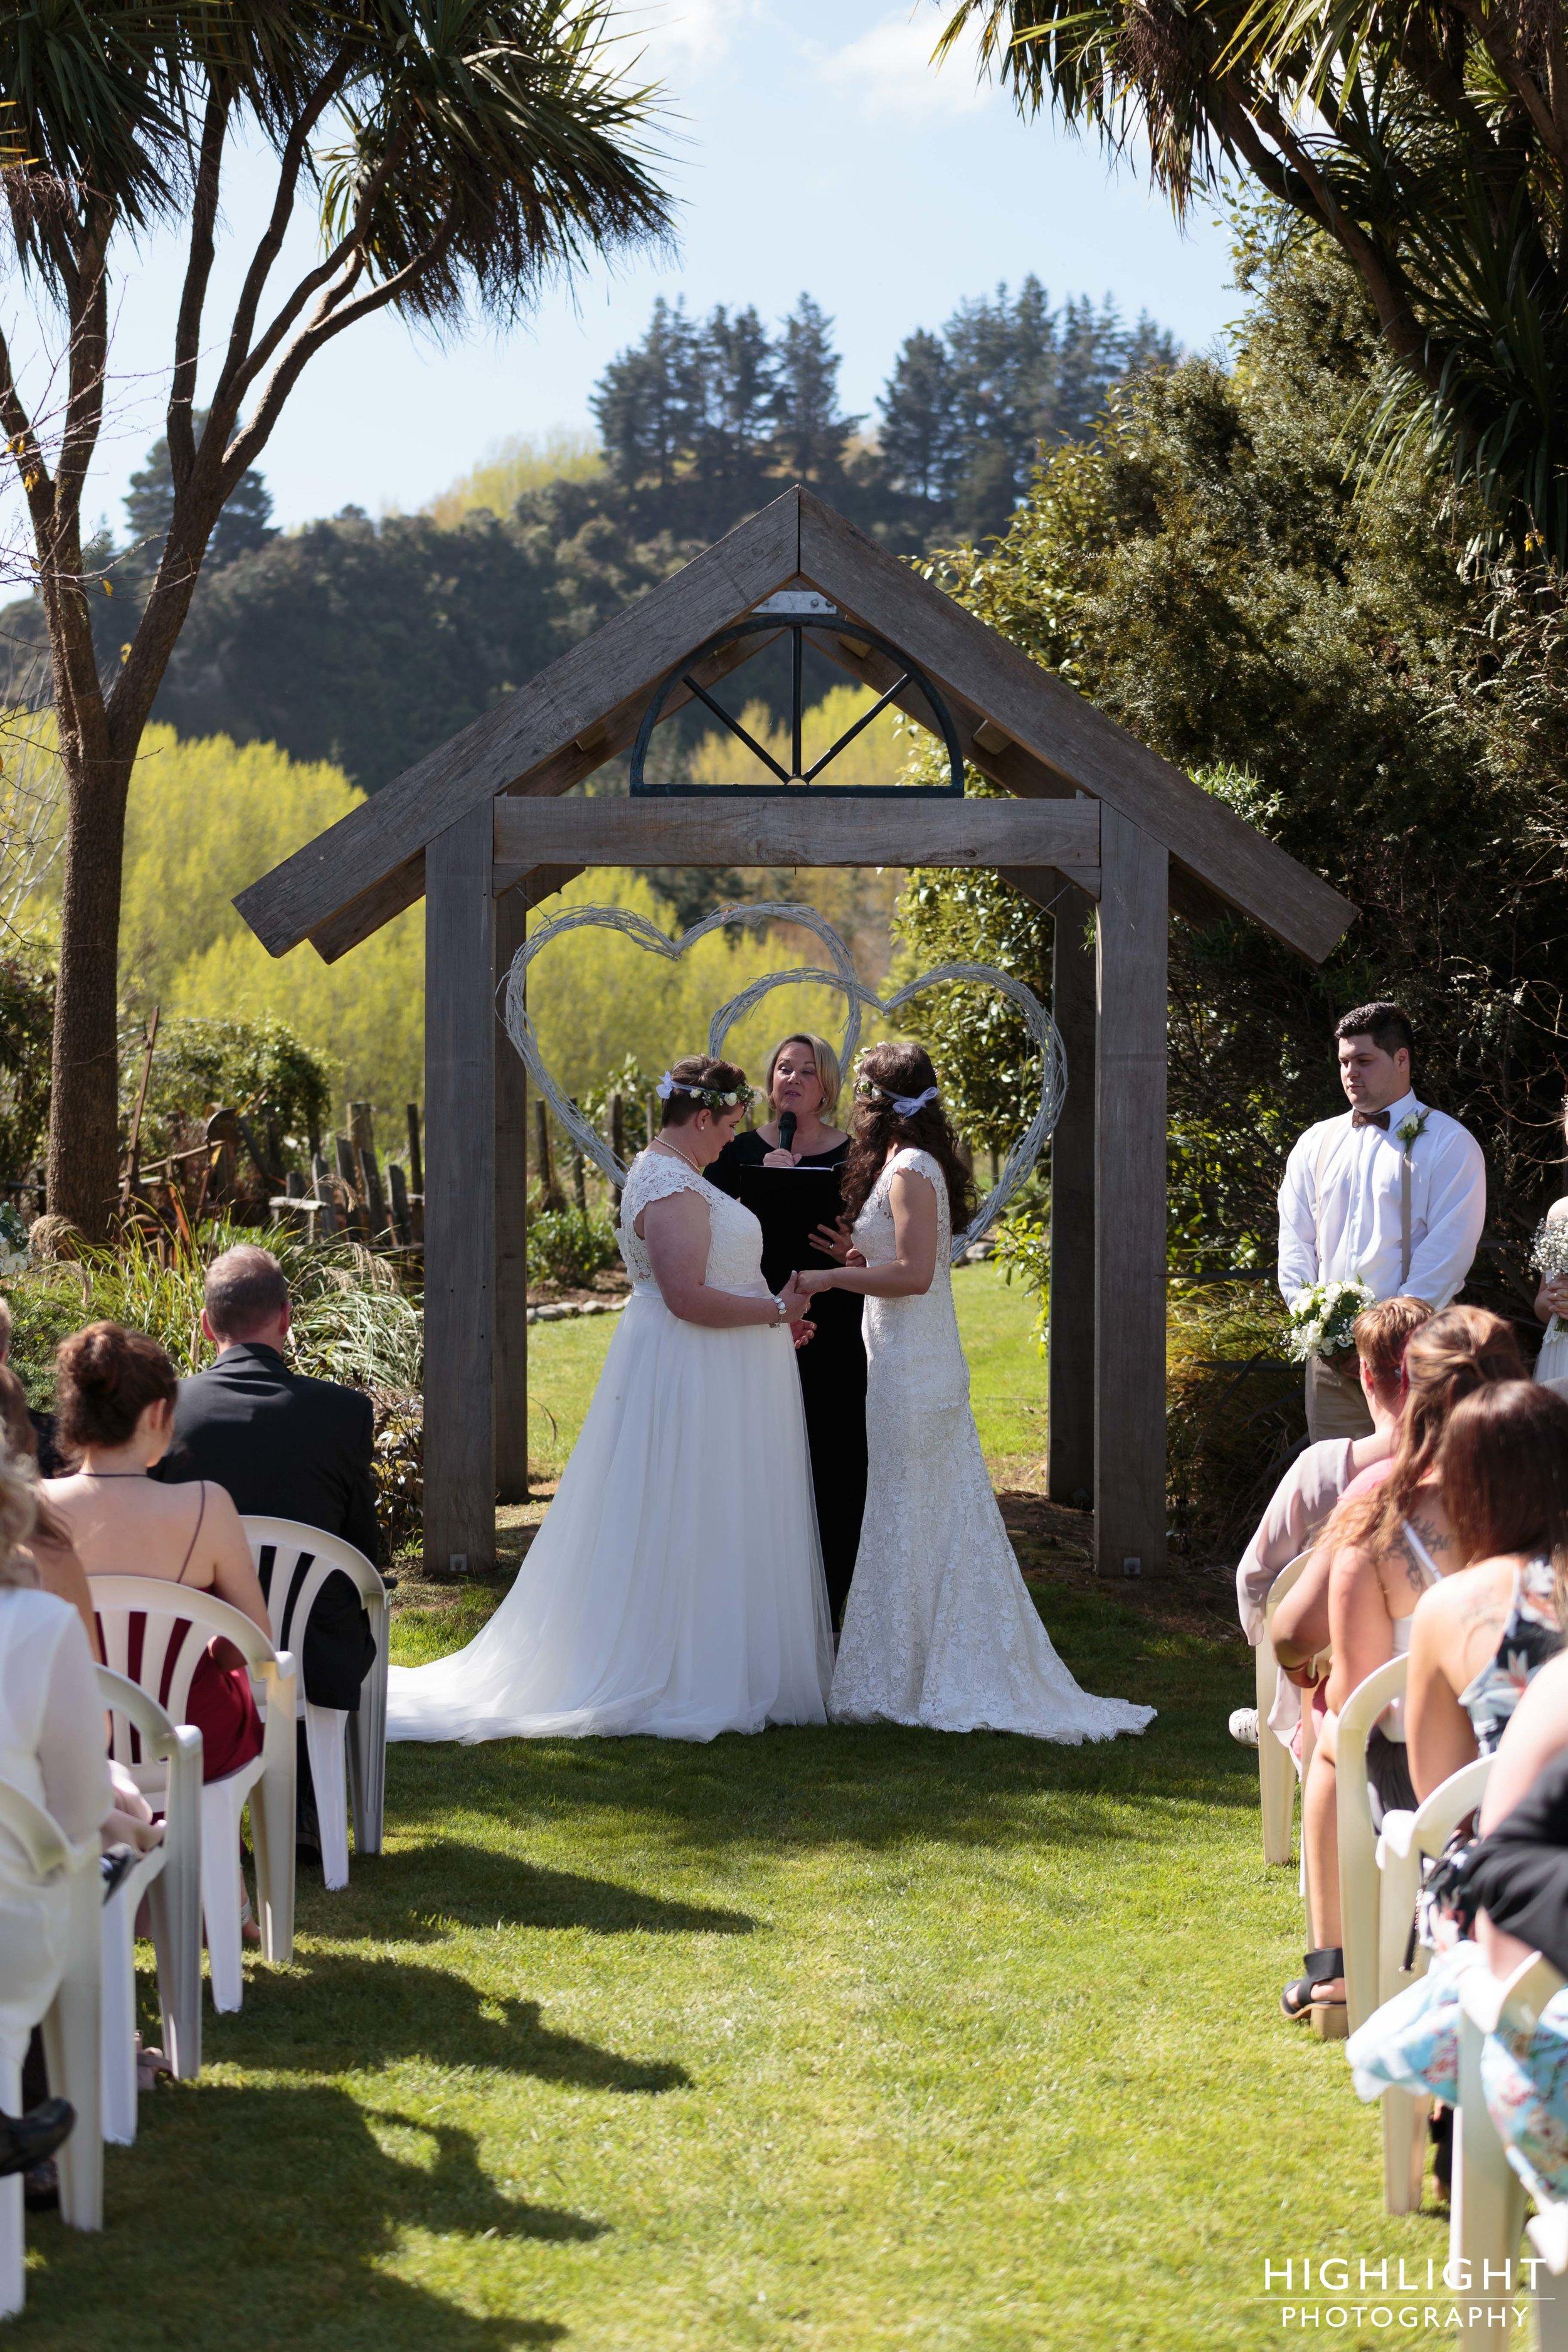 highlight_wedding_photography_makoura_lodge_manawatu_new_zealand-69.jpg